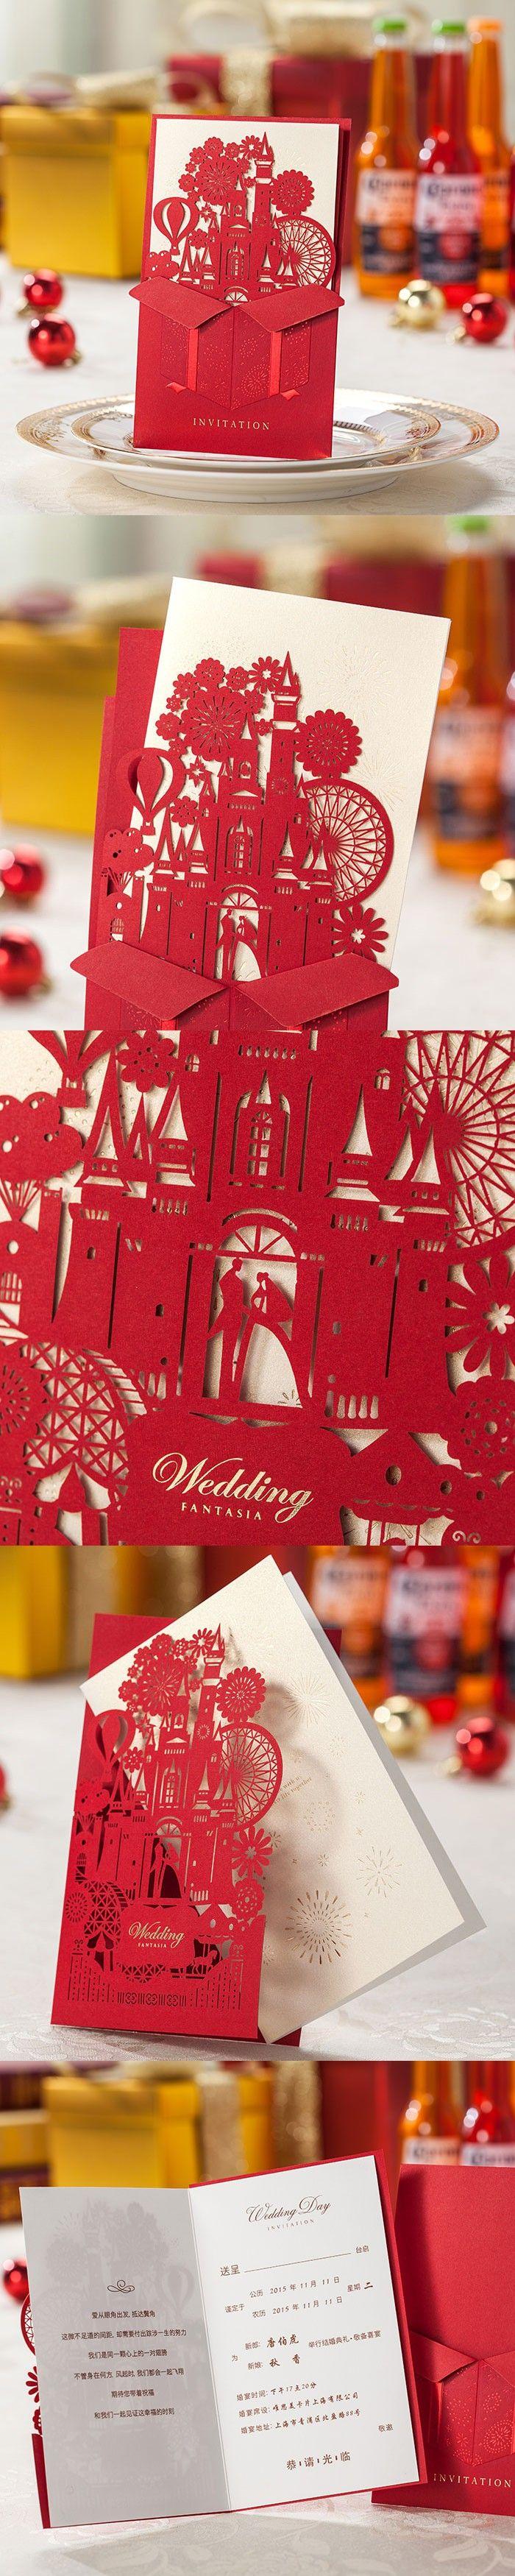 49 best pop up images on Pinterest   Invitations, Wedding stationery ...